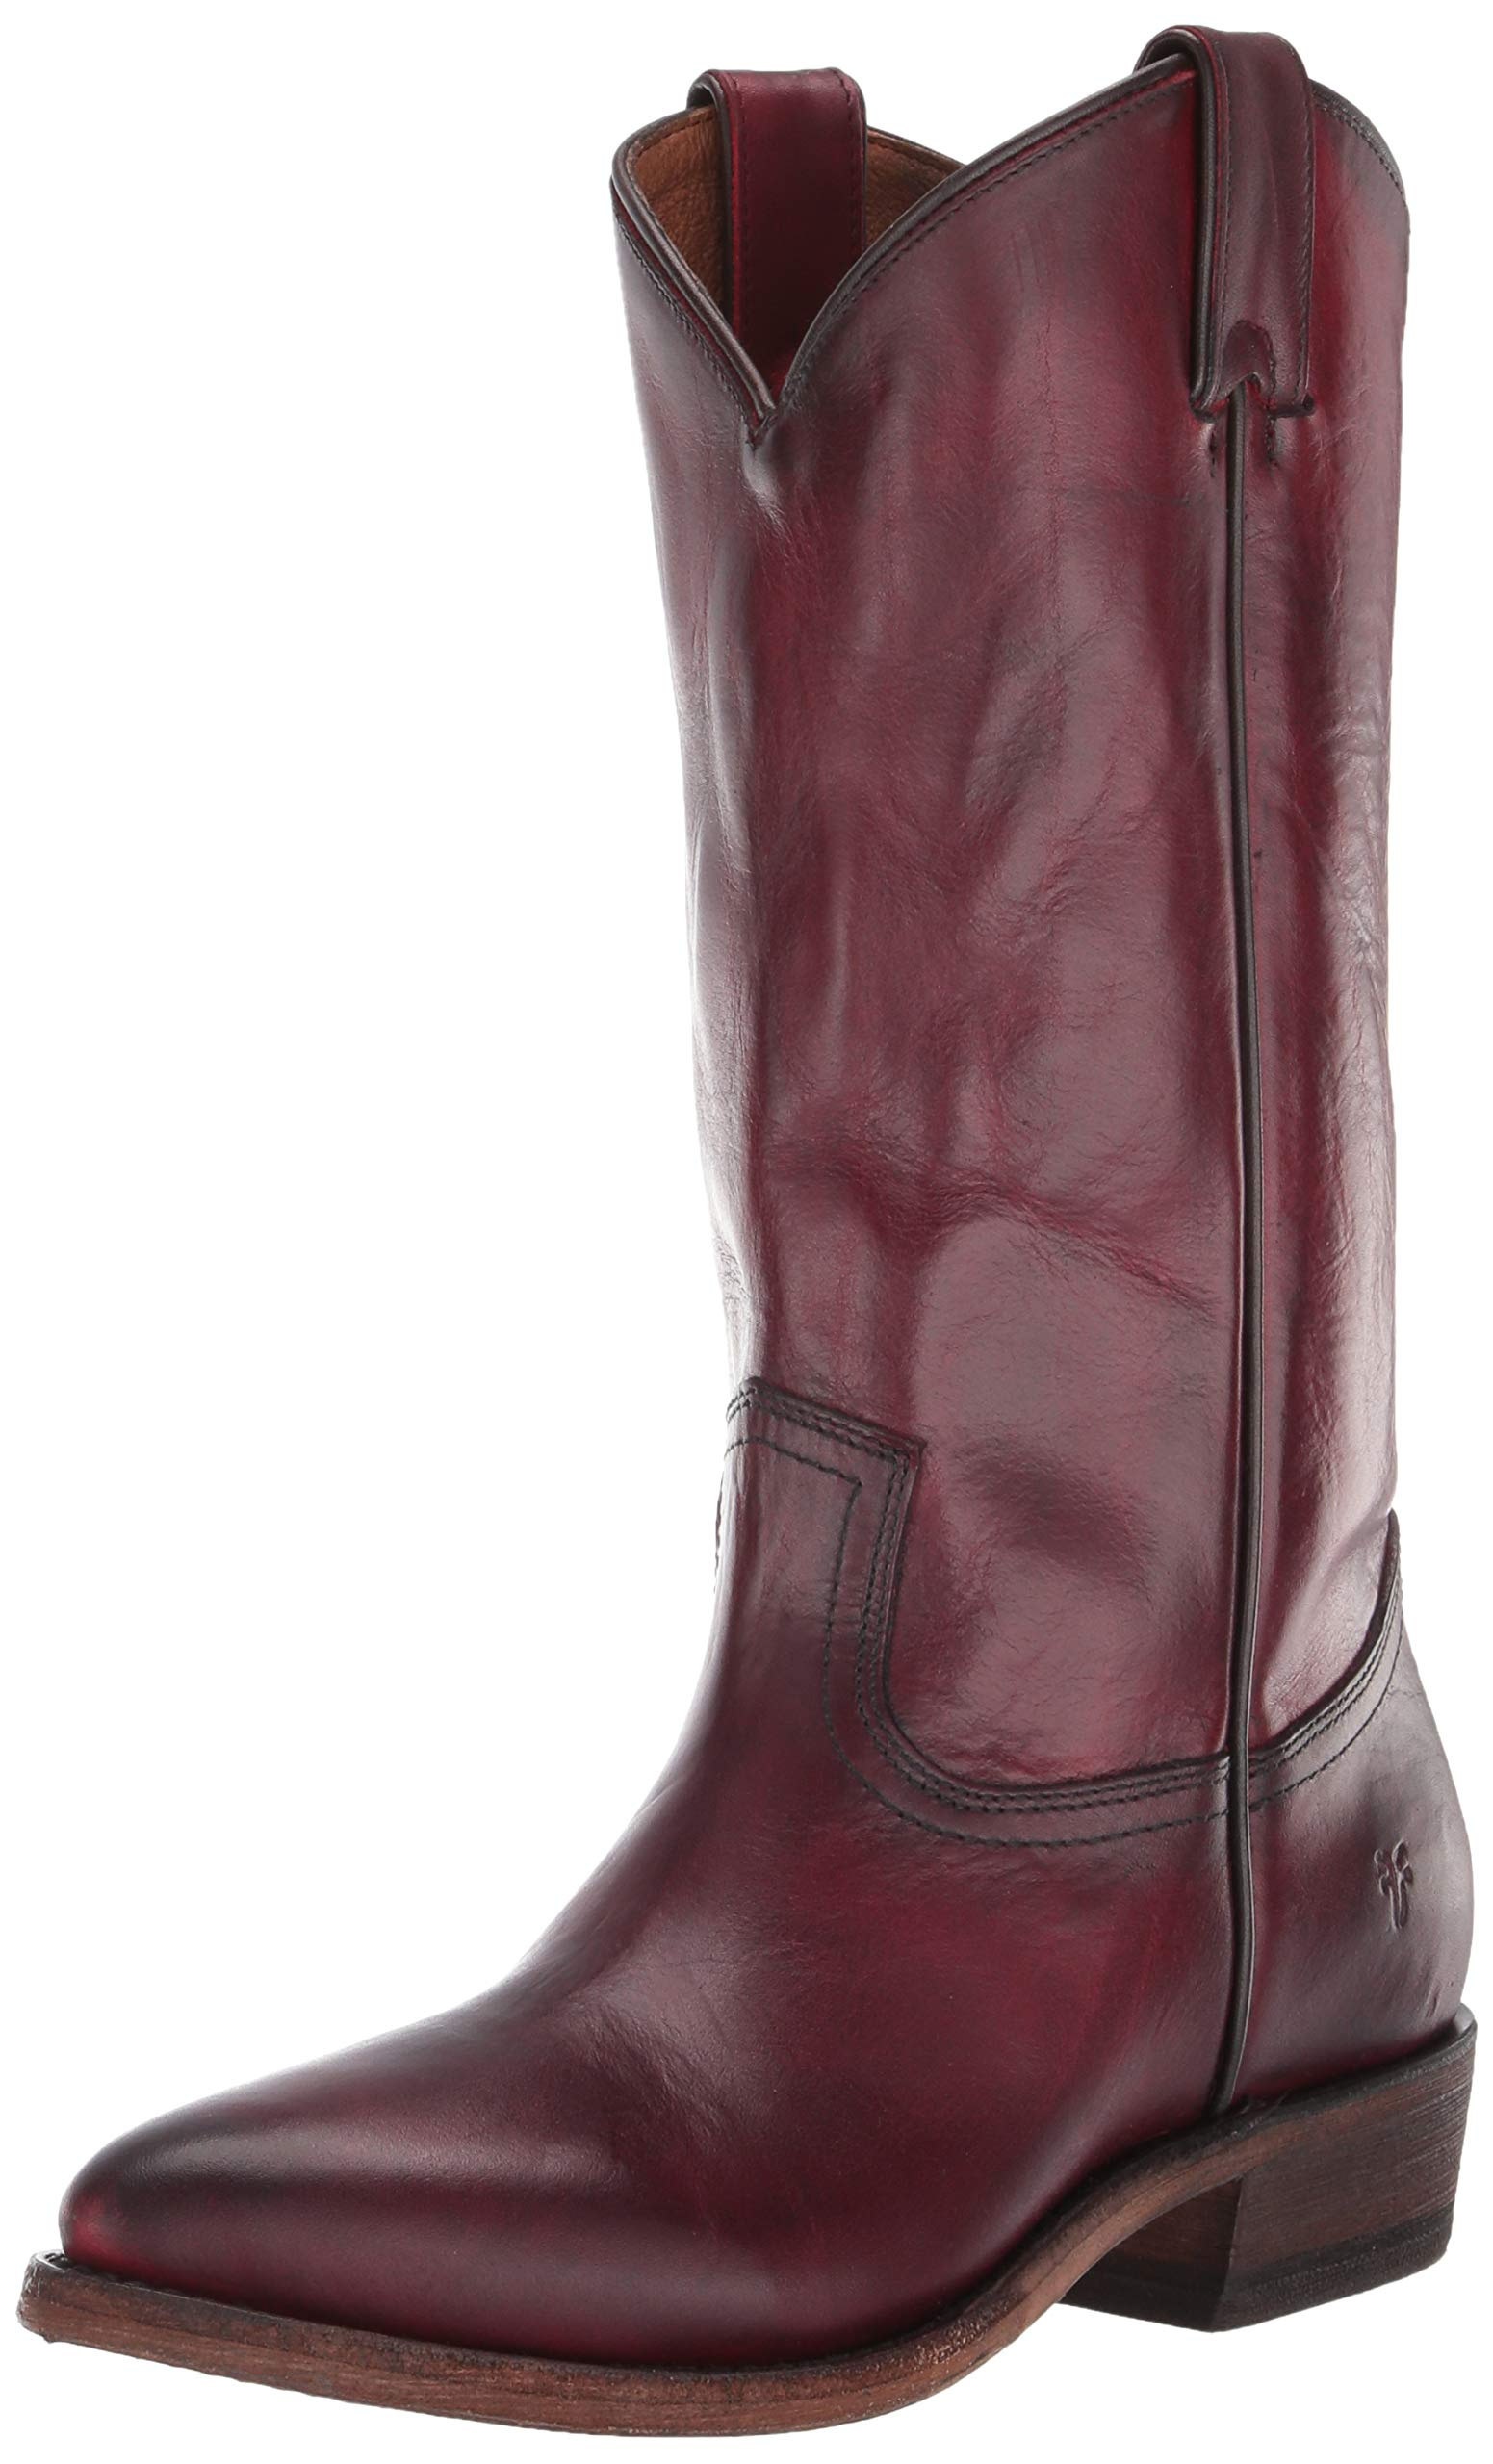 FRYE Women's Billy Pull On Western Boot, Red, 8 M US by FRYE